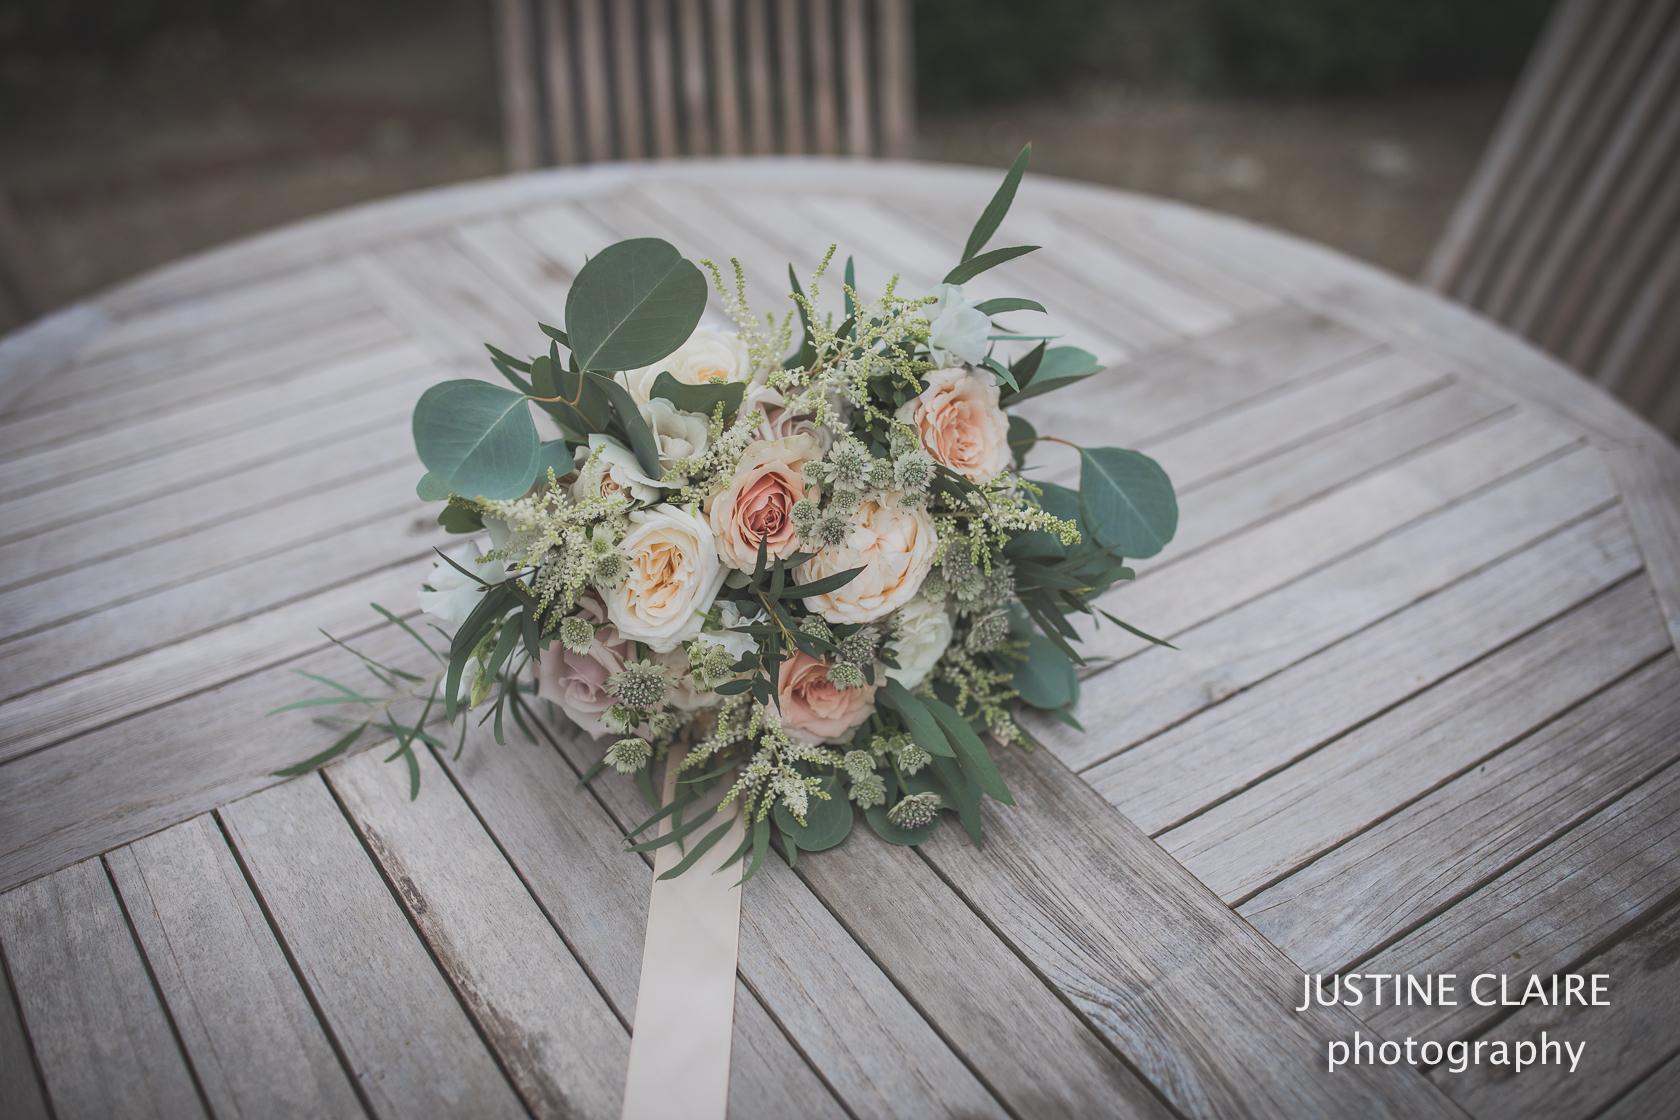 Fitzleroi Fittleworth petworth Billingshurst farm Wedding Photography by Justine Claire photographer Arundel Worthing Brighton-34.jpg